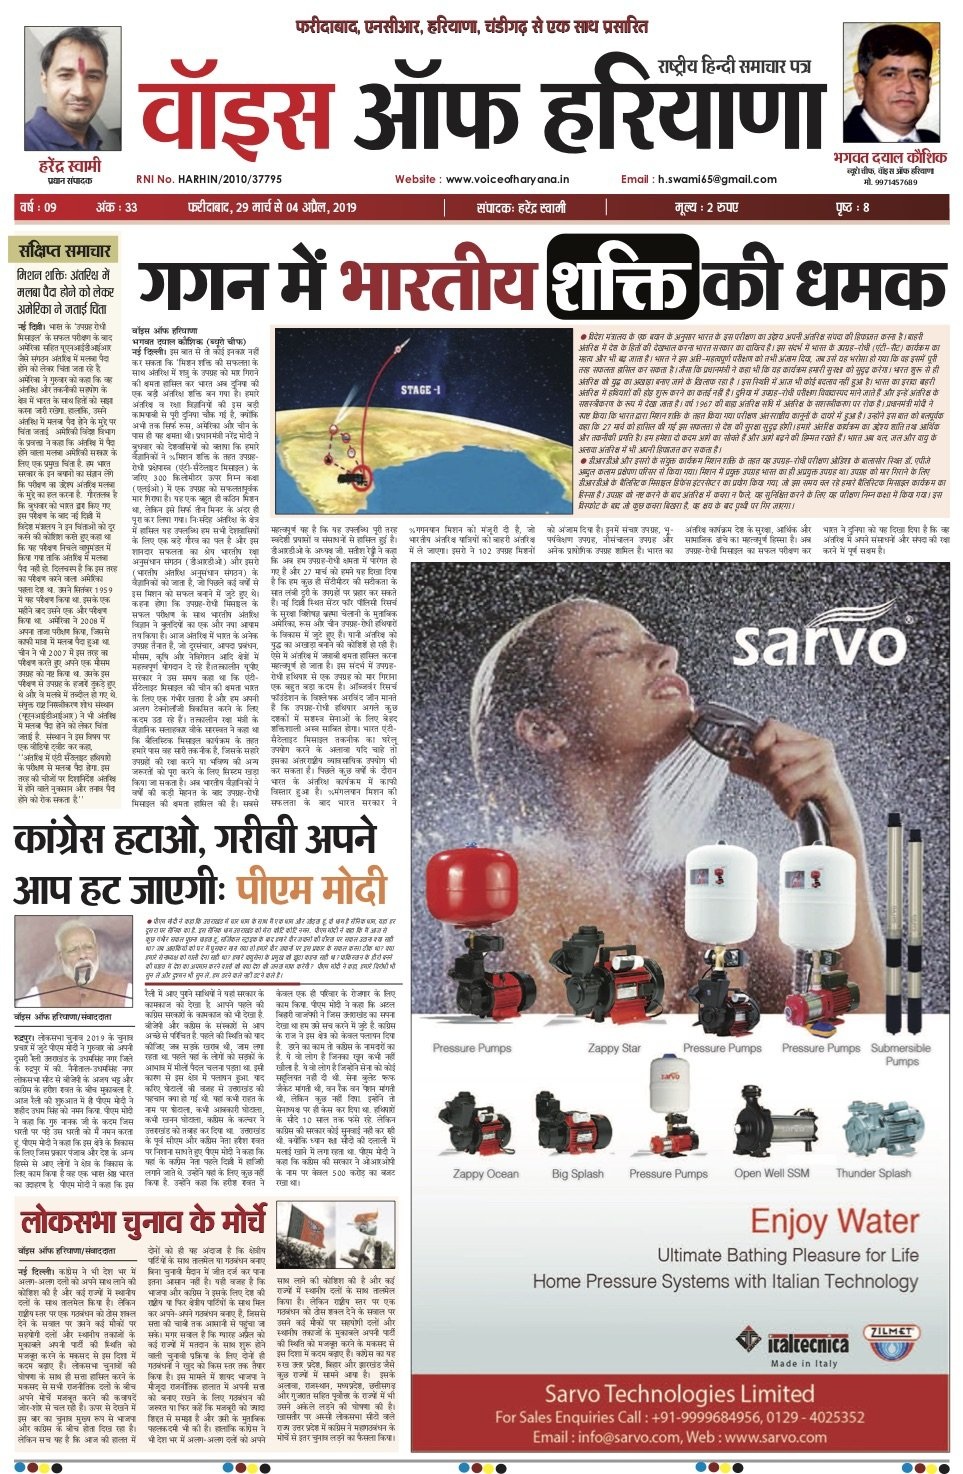 Voice of Haryana – Sarvo